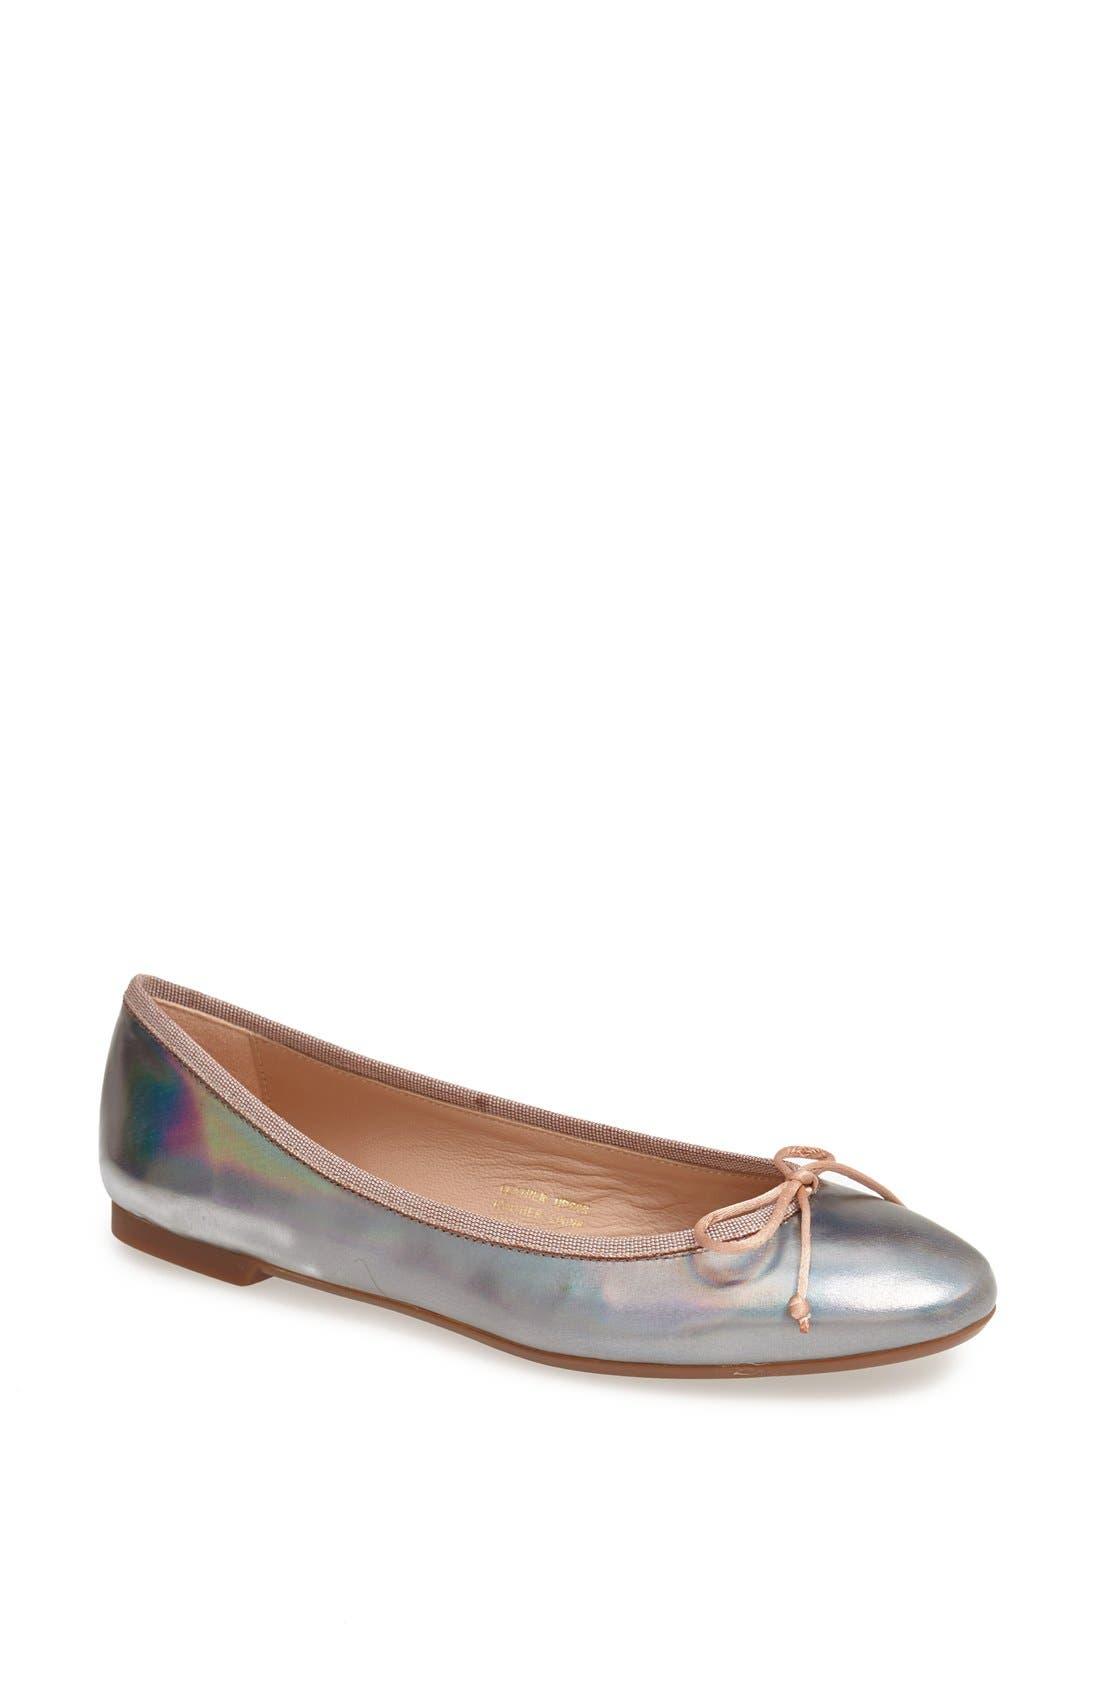 Main Image - Sweet Ballerina Metallic Ballet Flat (Women)